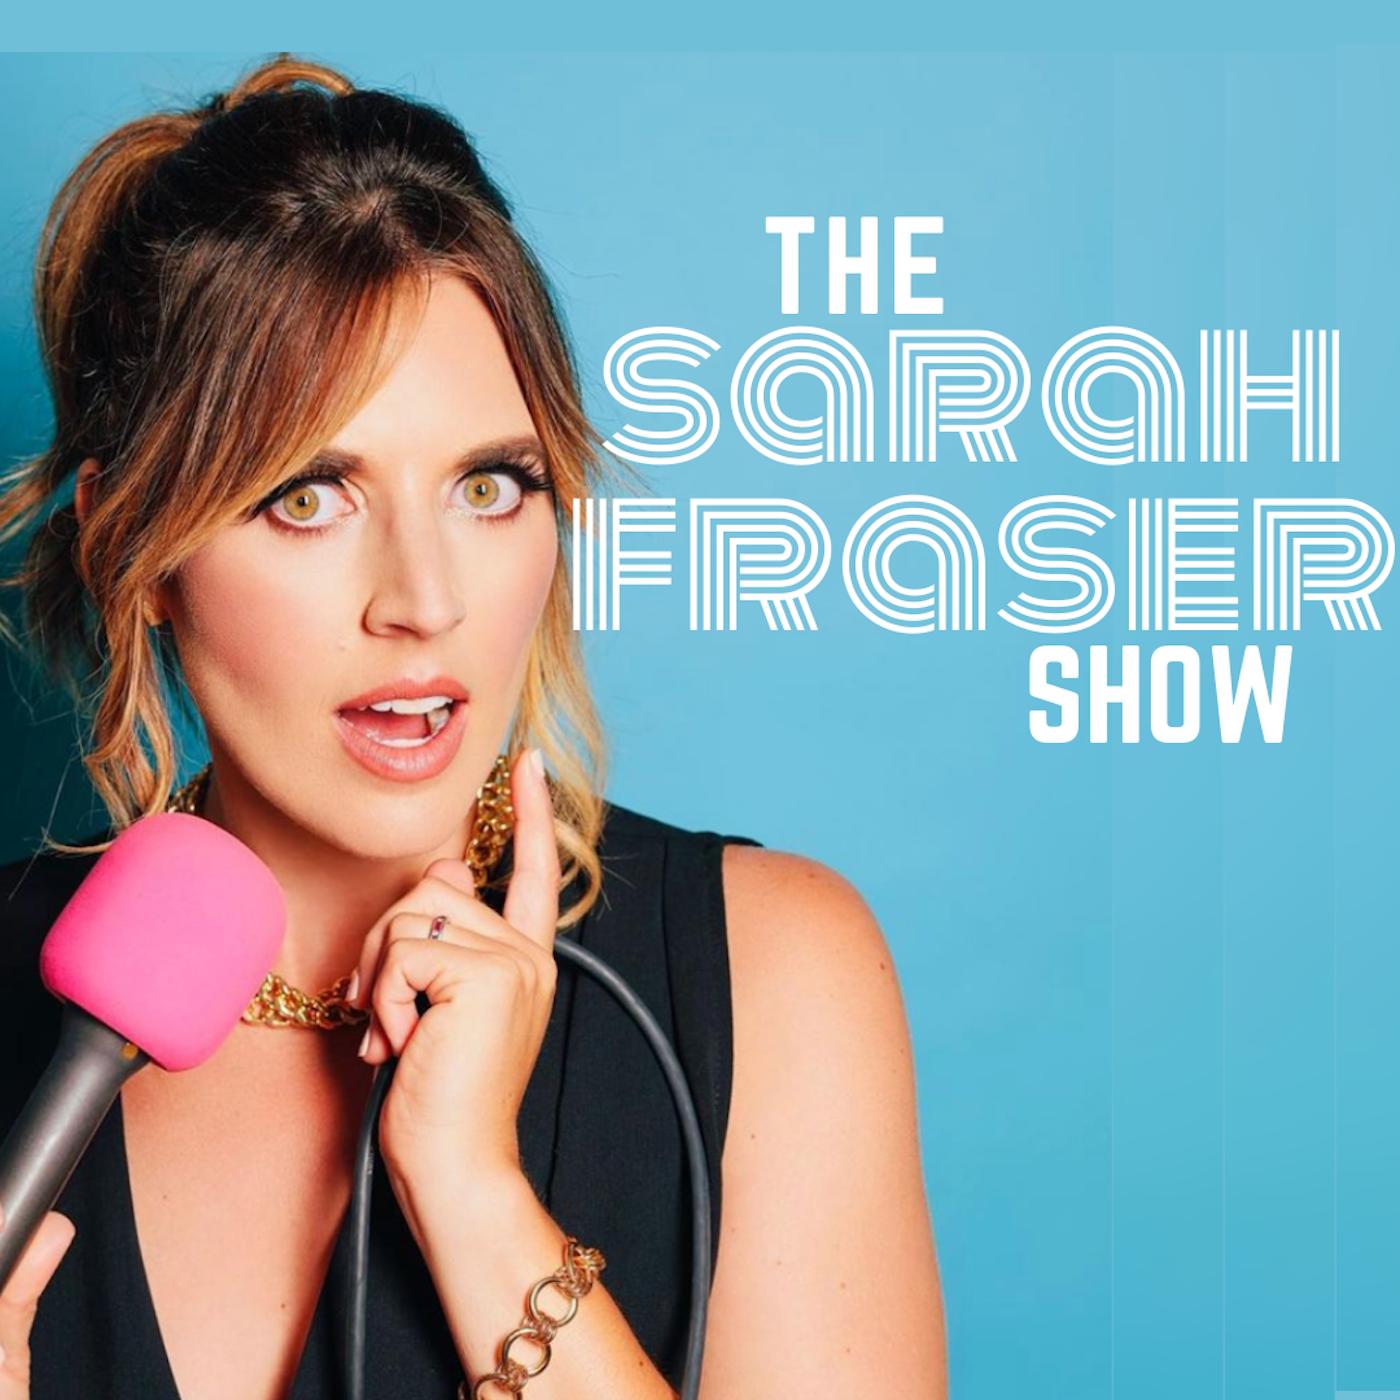 The Sarah Fraser Show show art